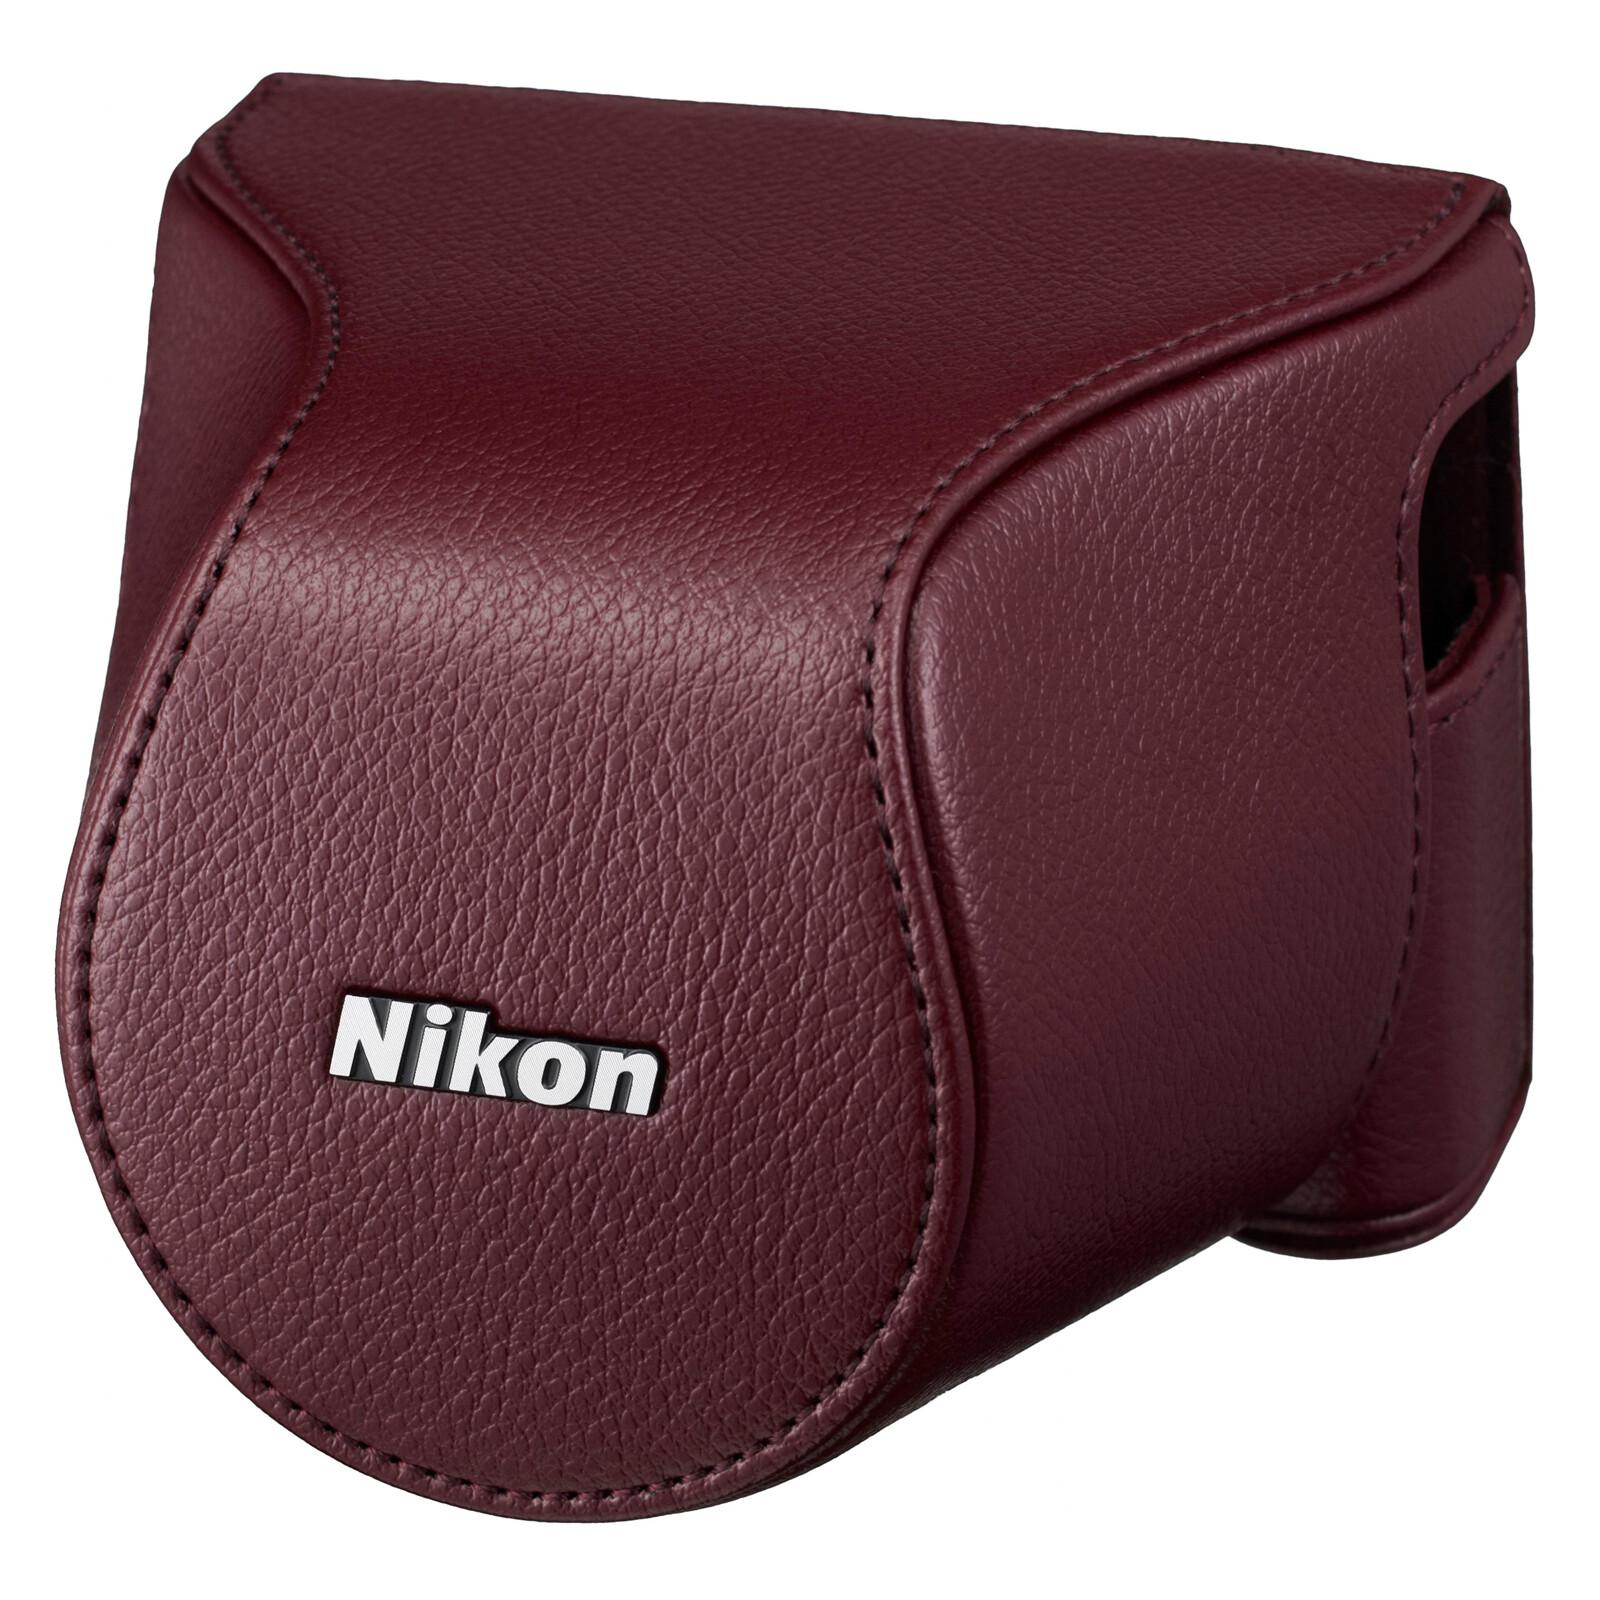 Nikon CB-N2200S Tasche bordeaux